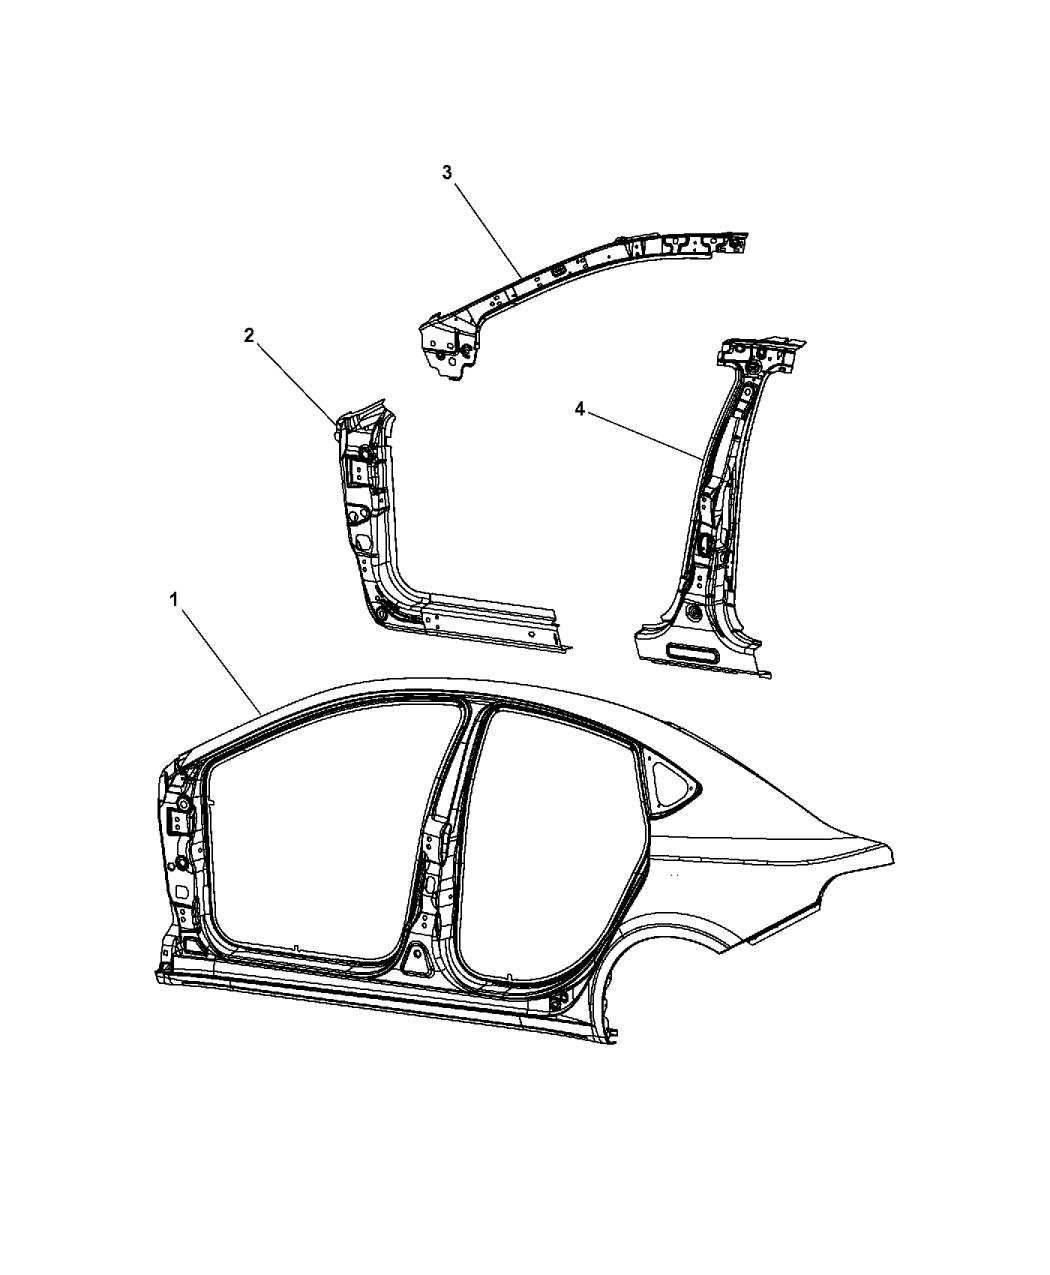 2013 dodge dart 2 0l engine diagram